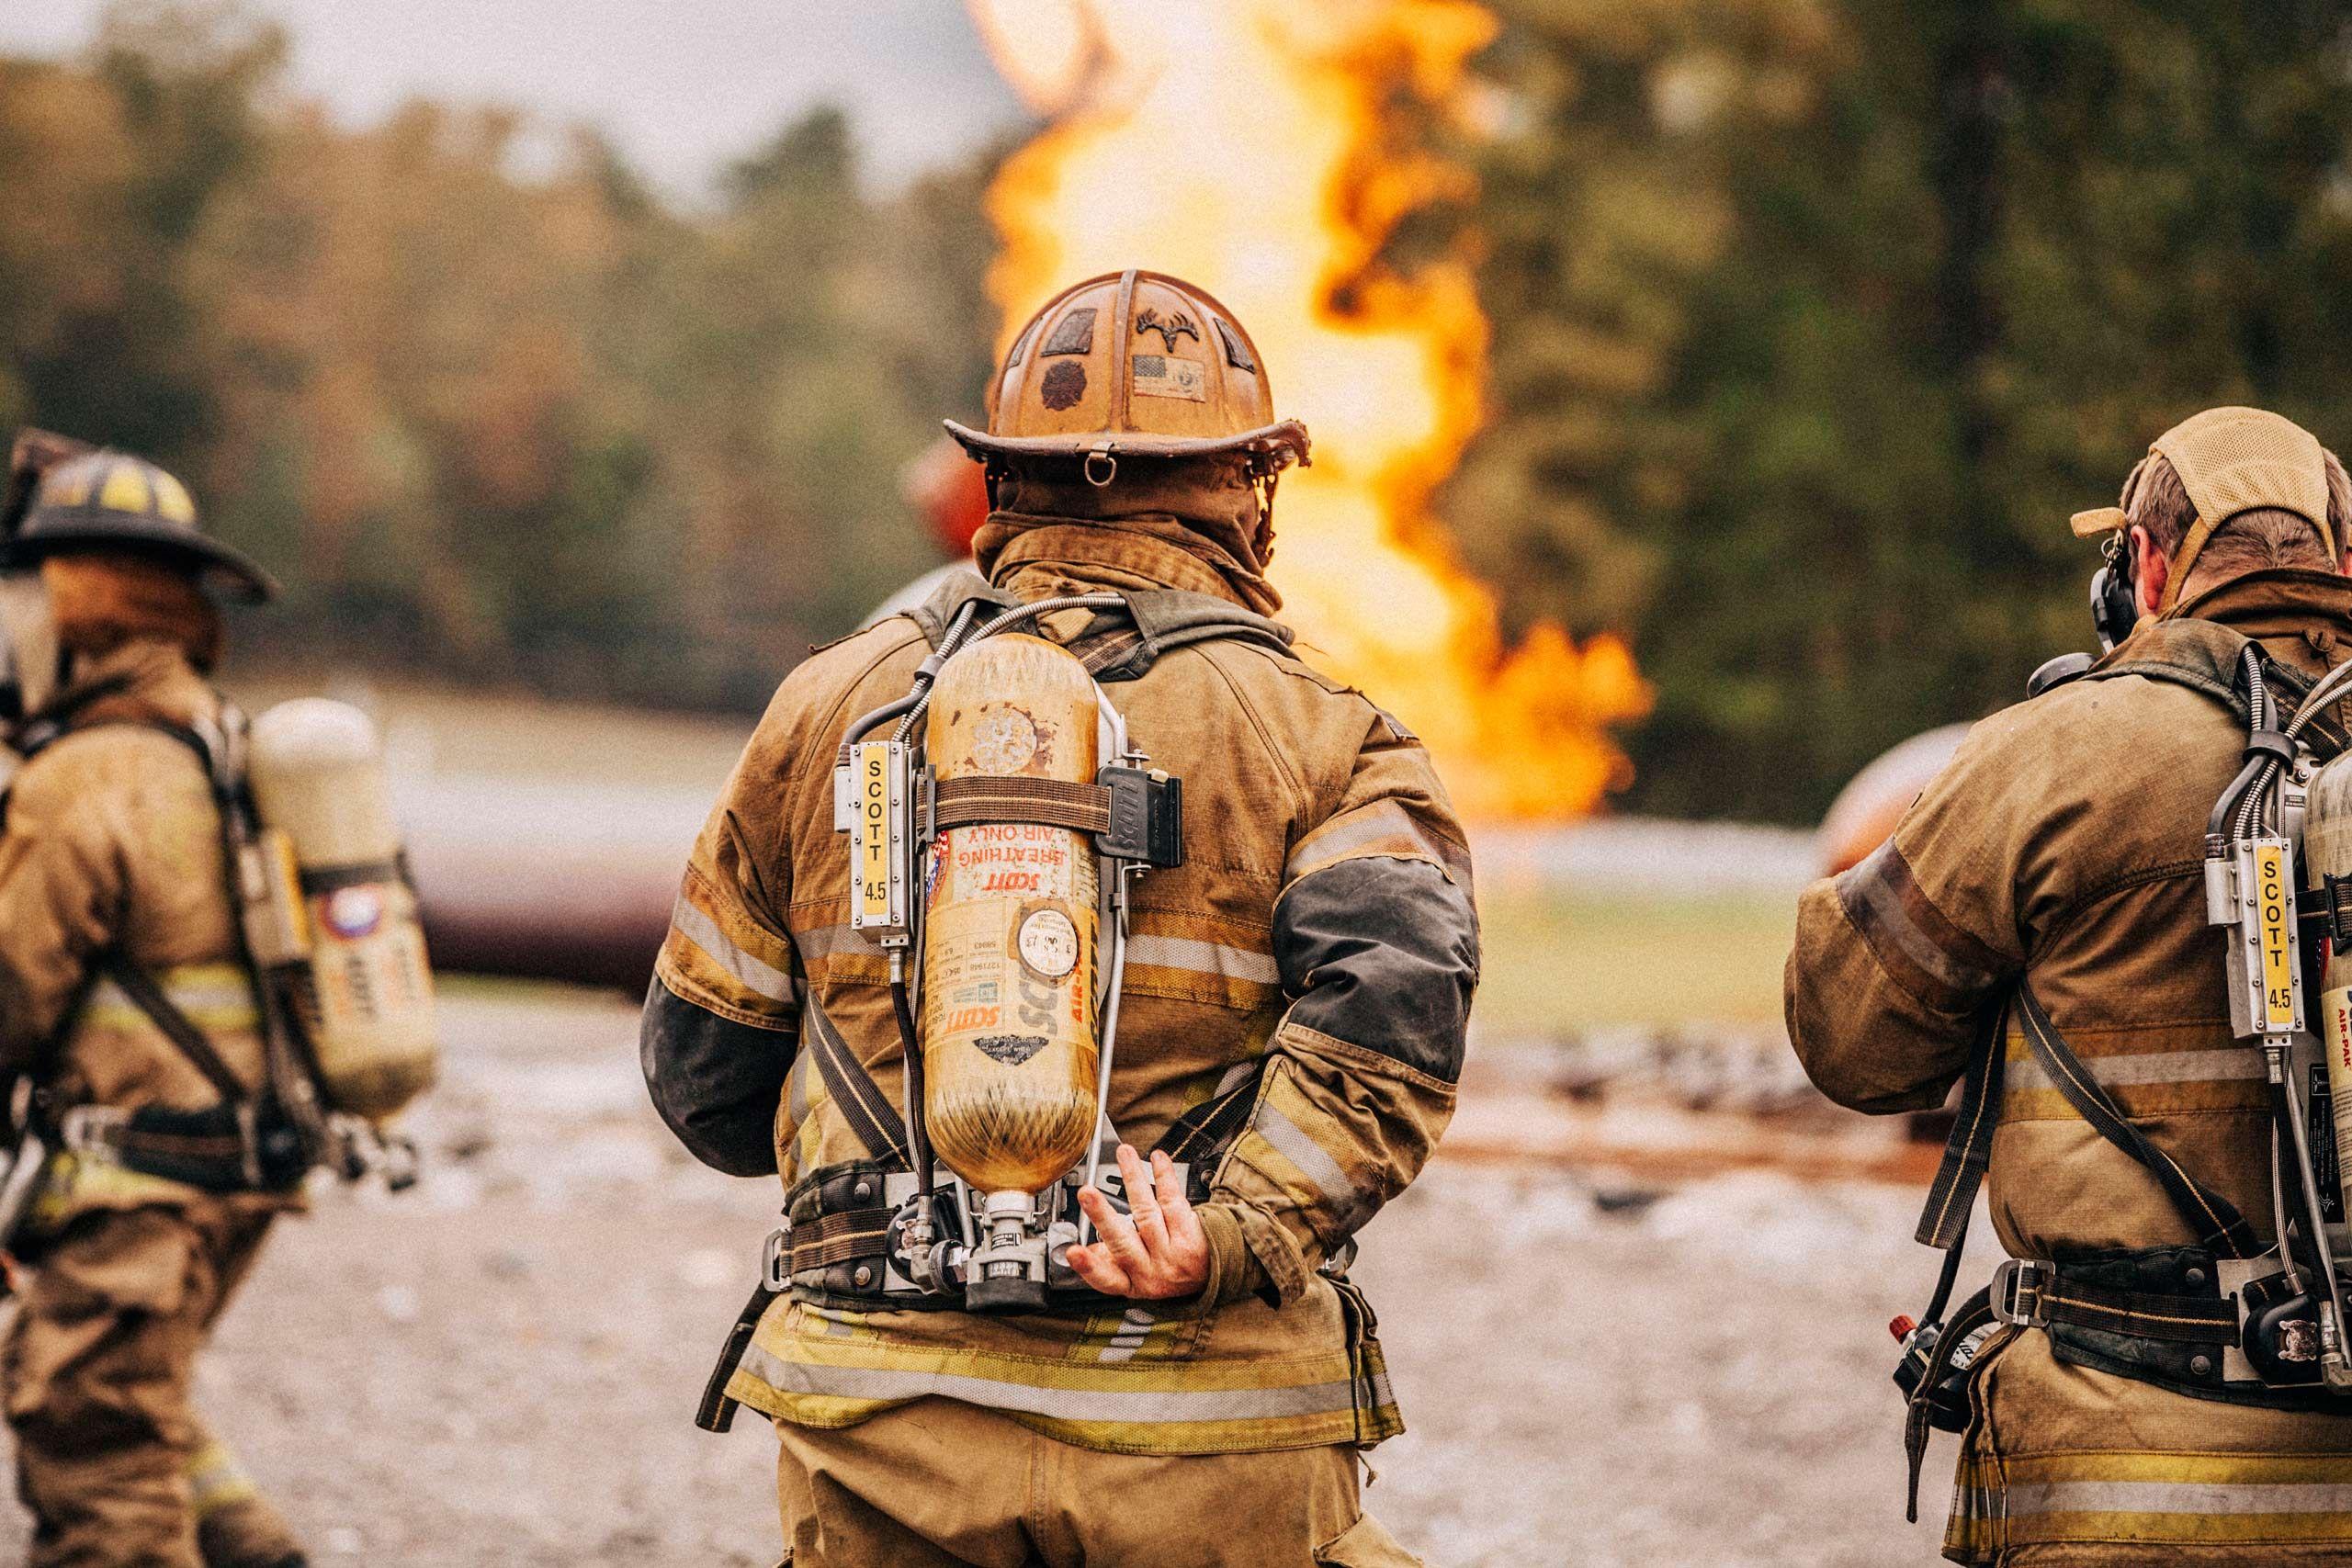 Firemen Facing a Training Fire